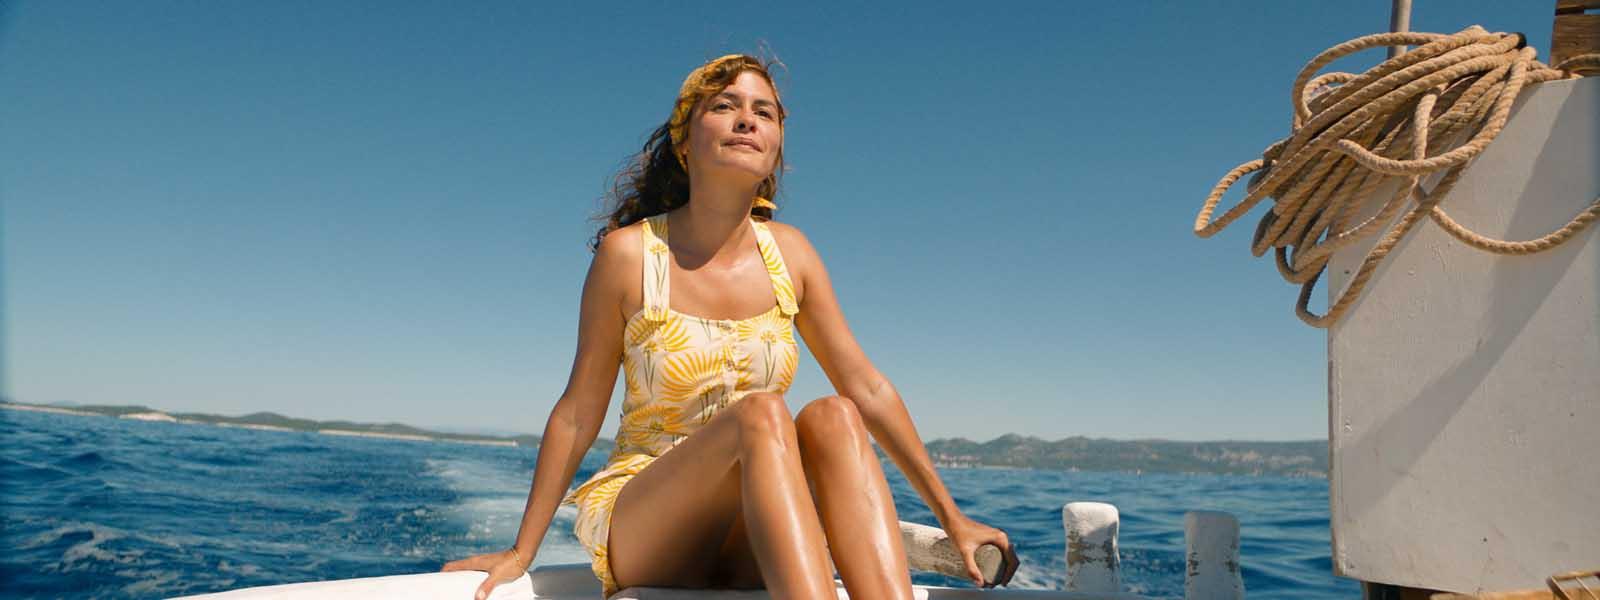 Simone Melchior Cousteau (Audrey Tautou)